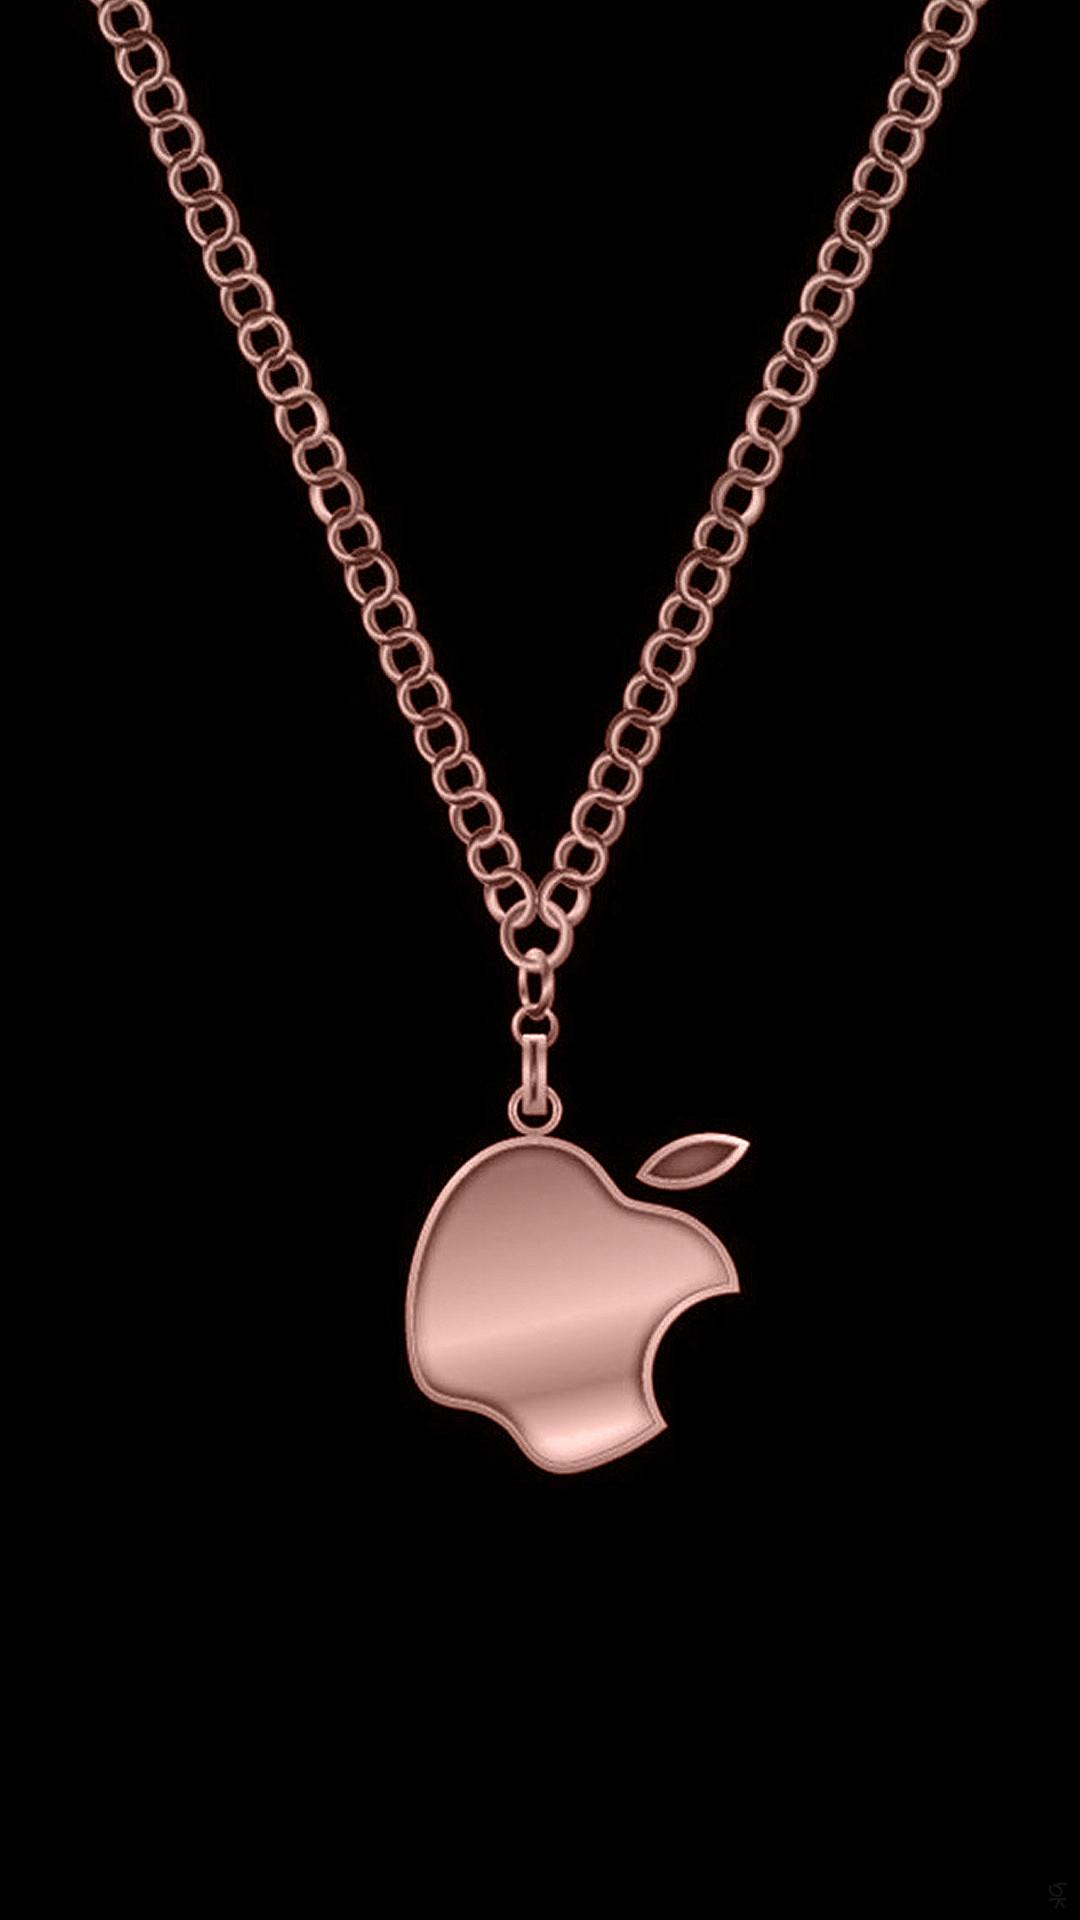 6 Plus Rose Gold Apple. Iphone BackgroundsIphone WallpapersApple …